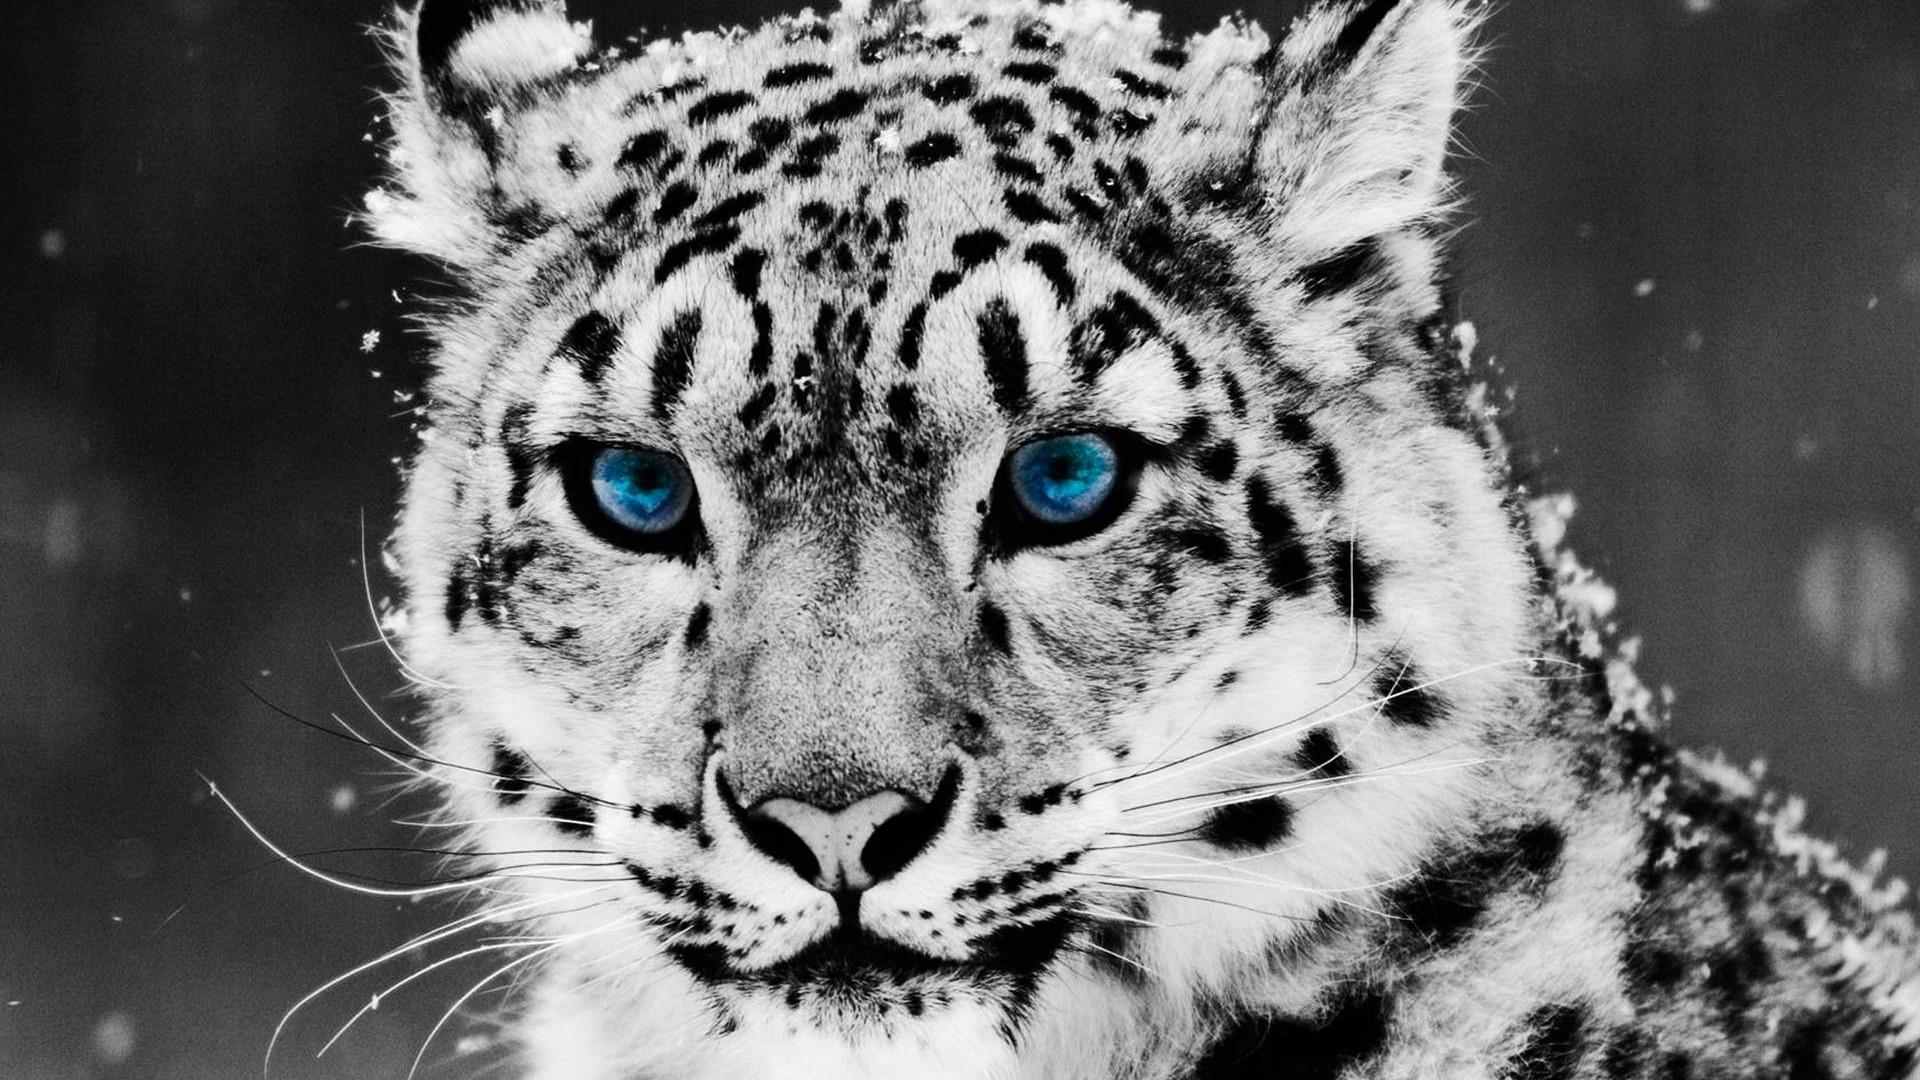 Snow Leopard Wallpaper High Quality WallpapersWallpaper Desktop 1920x1080